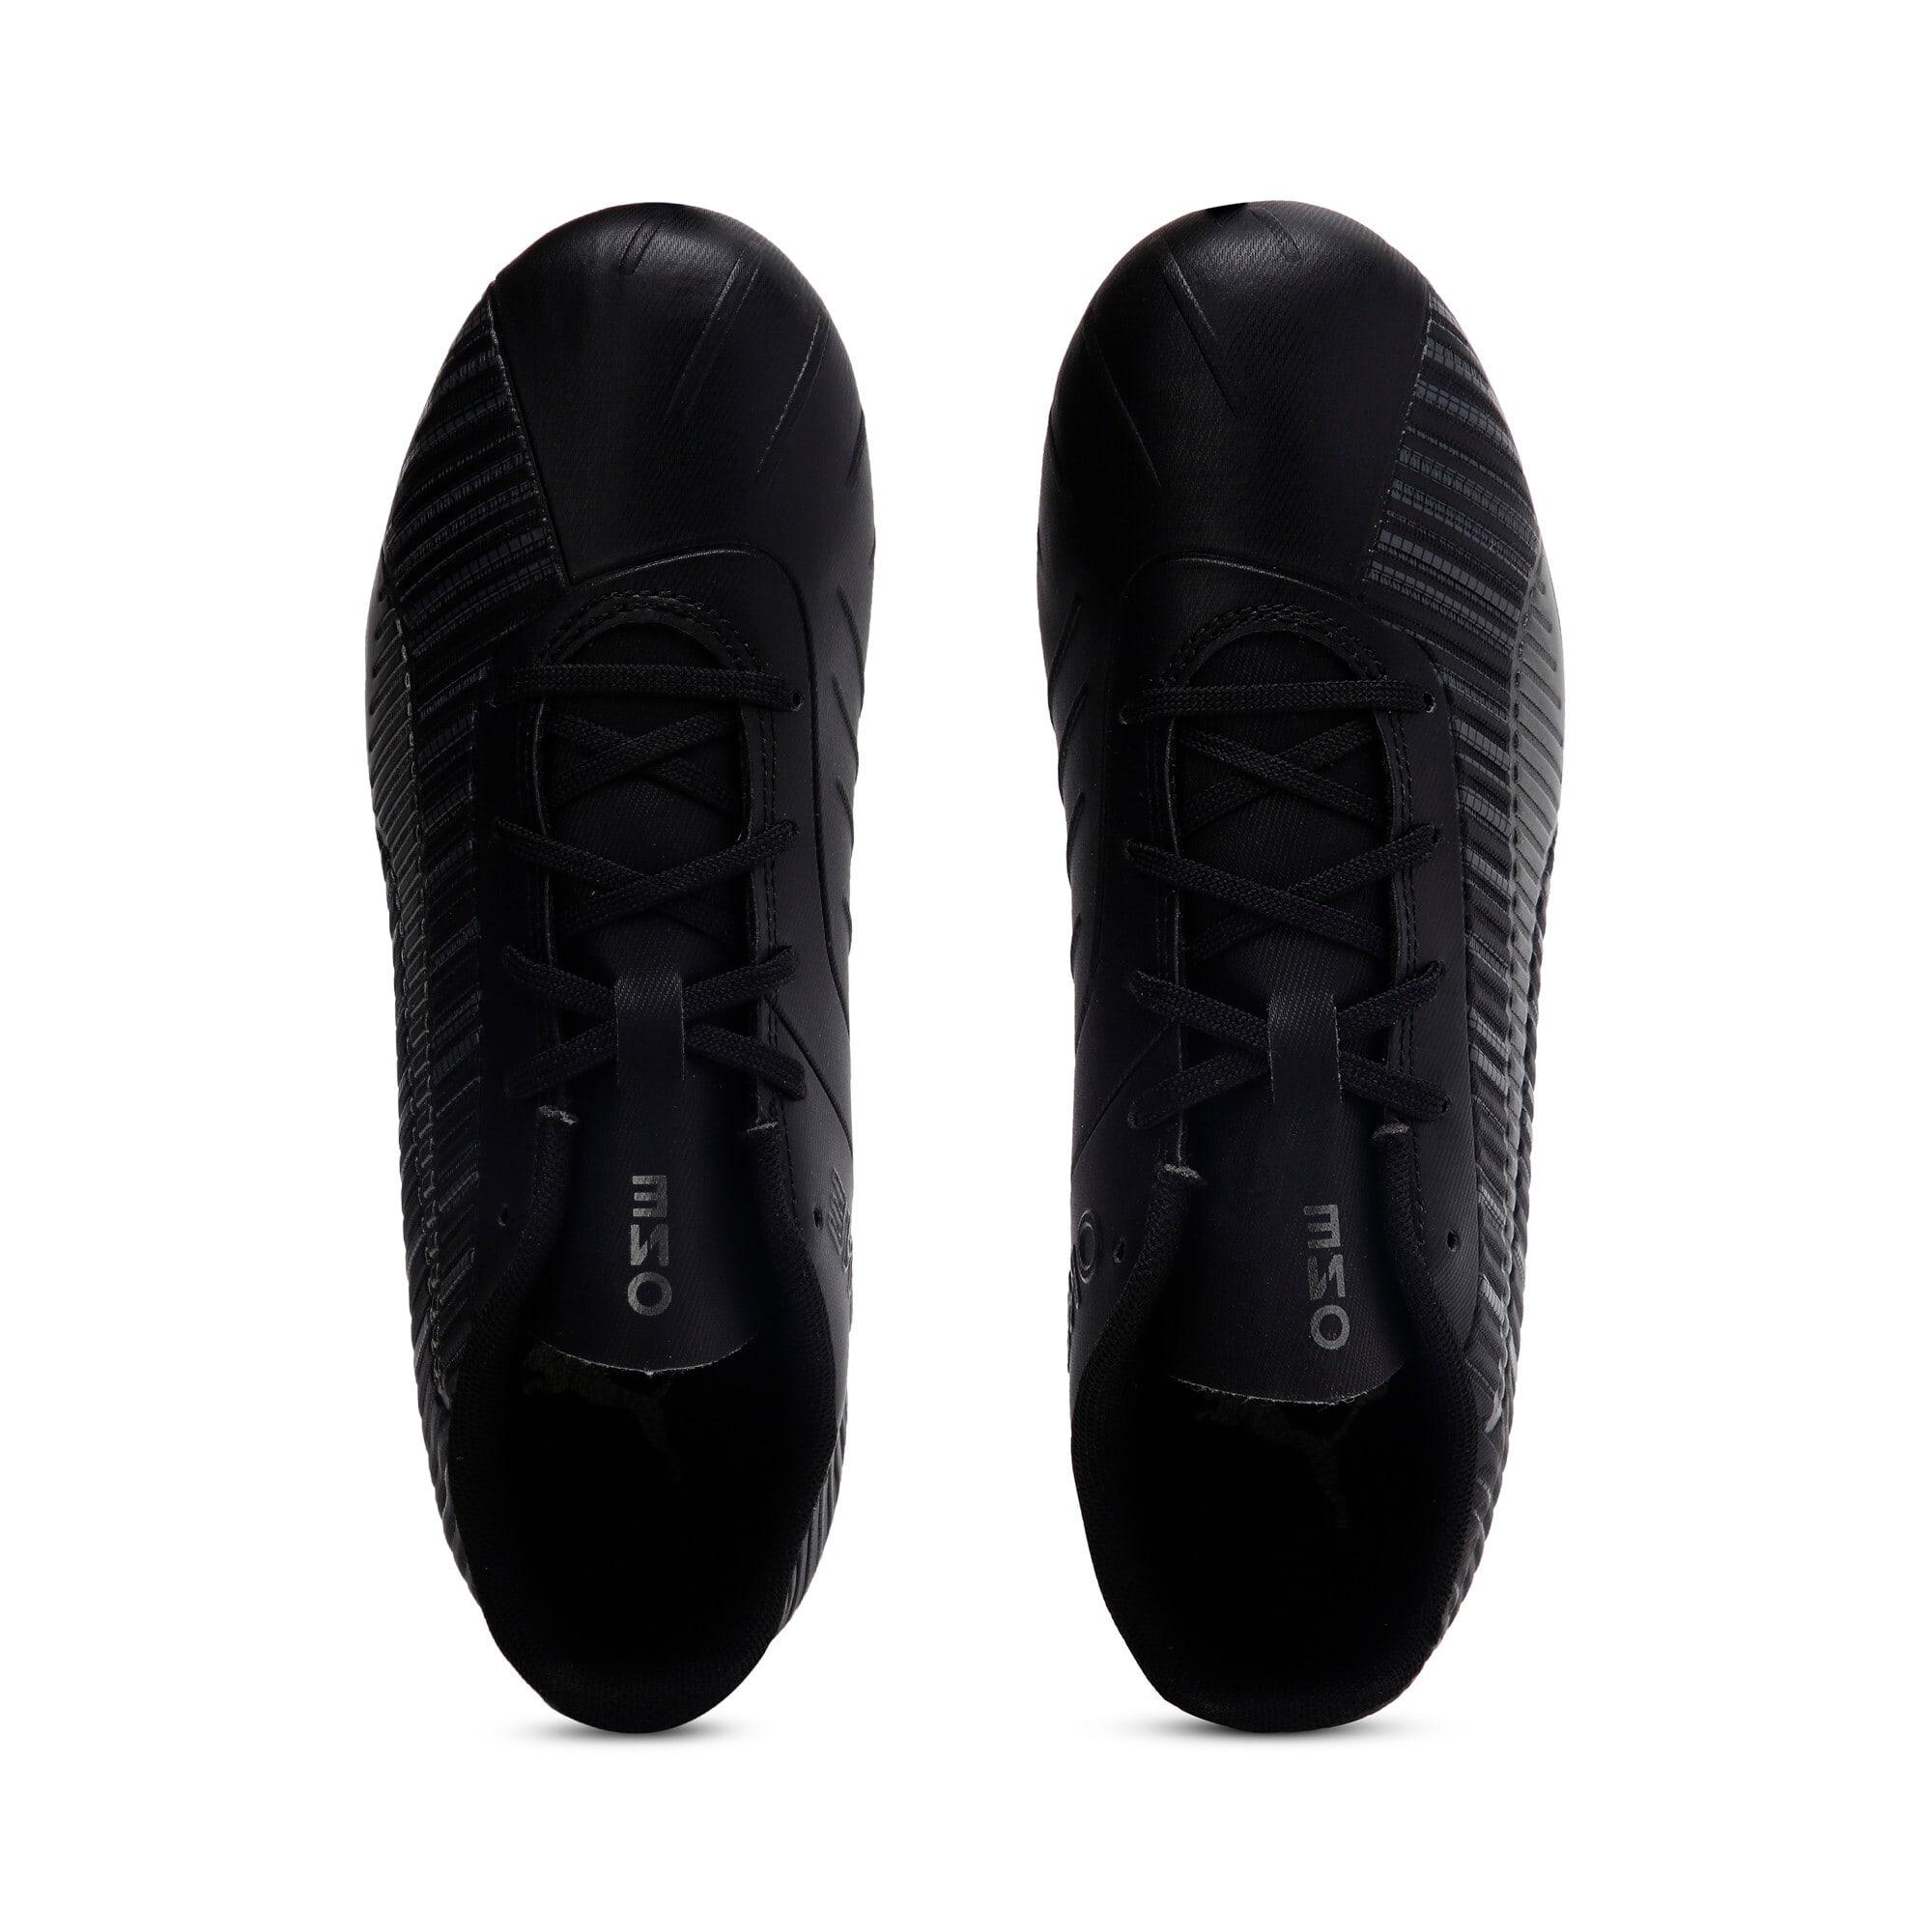 Thumbnail 6 of PUMA ONE 5.4 IT Youth Football Boots, Black-Black-Puma Aged Silver, medium-IND